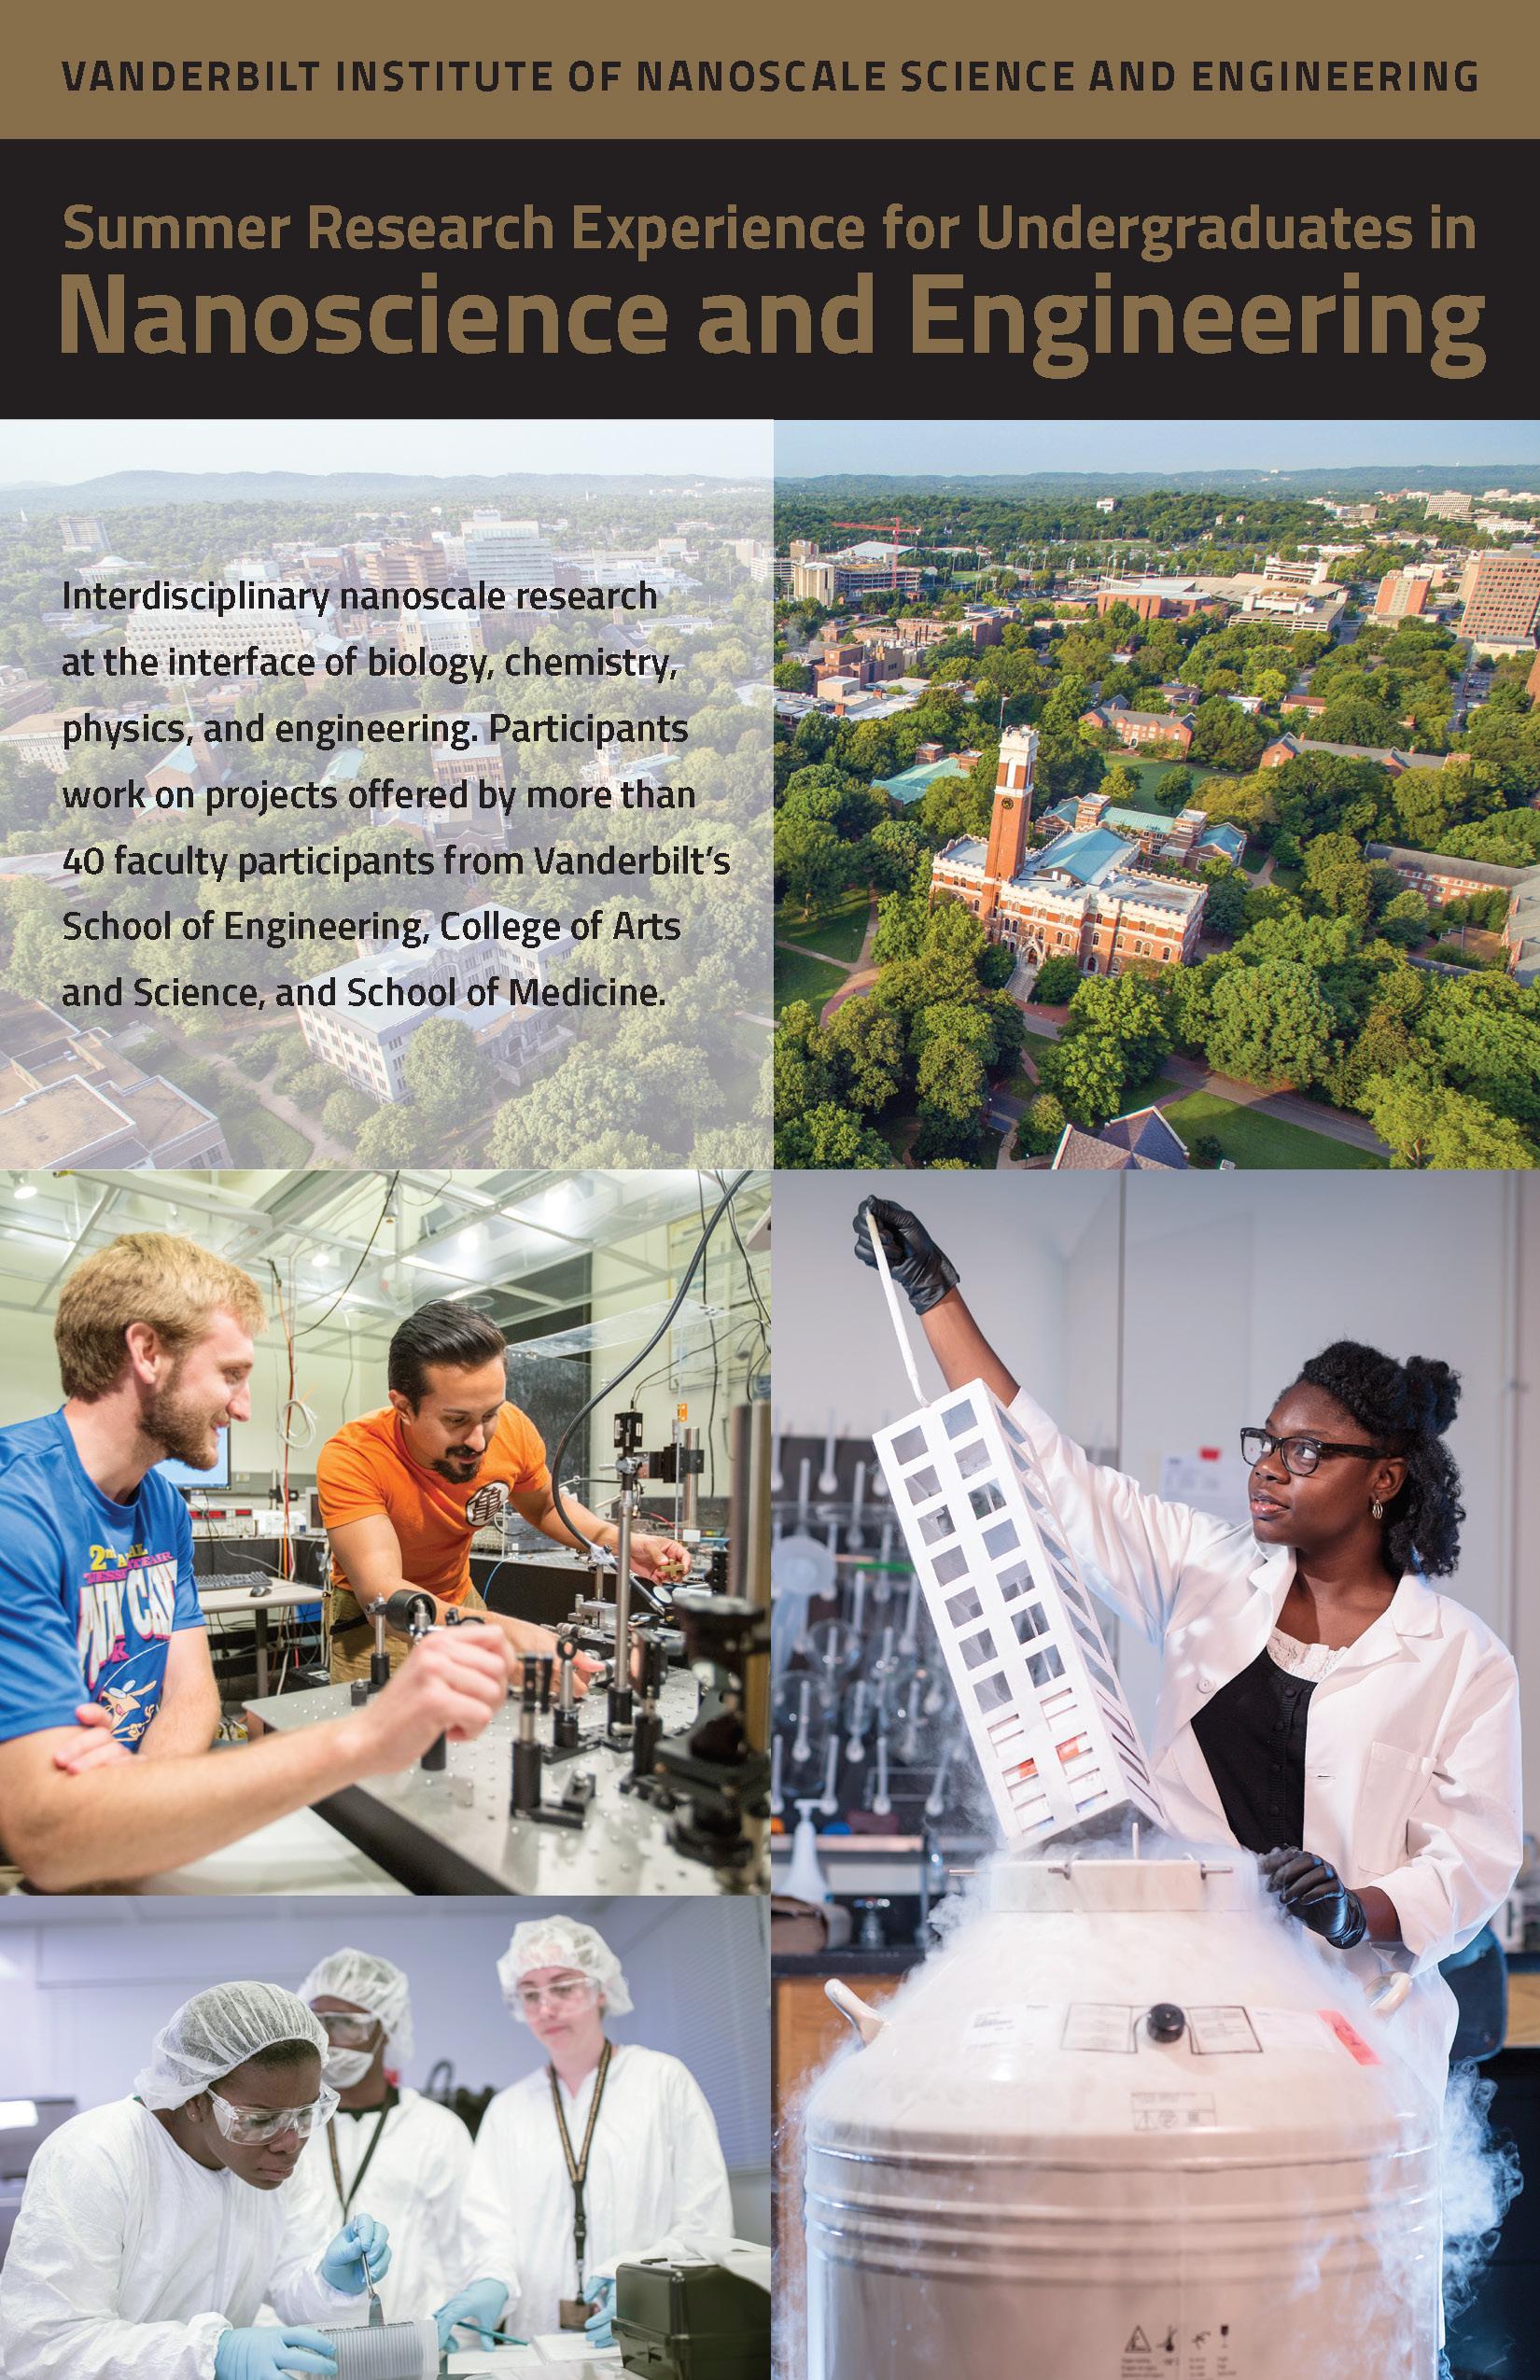 Vanderbilt University Jobs >> Vanderbilt University Reu In Nanoscience And Nanoengineering